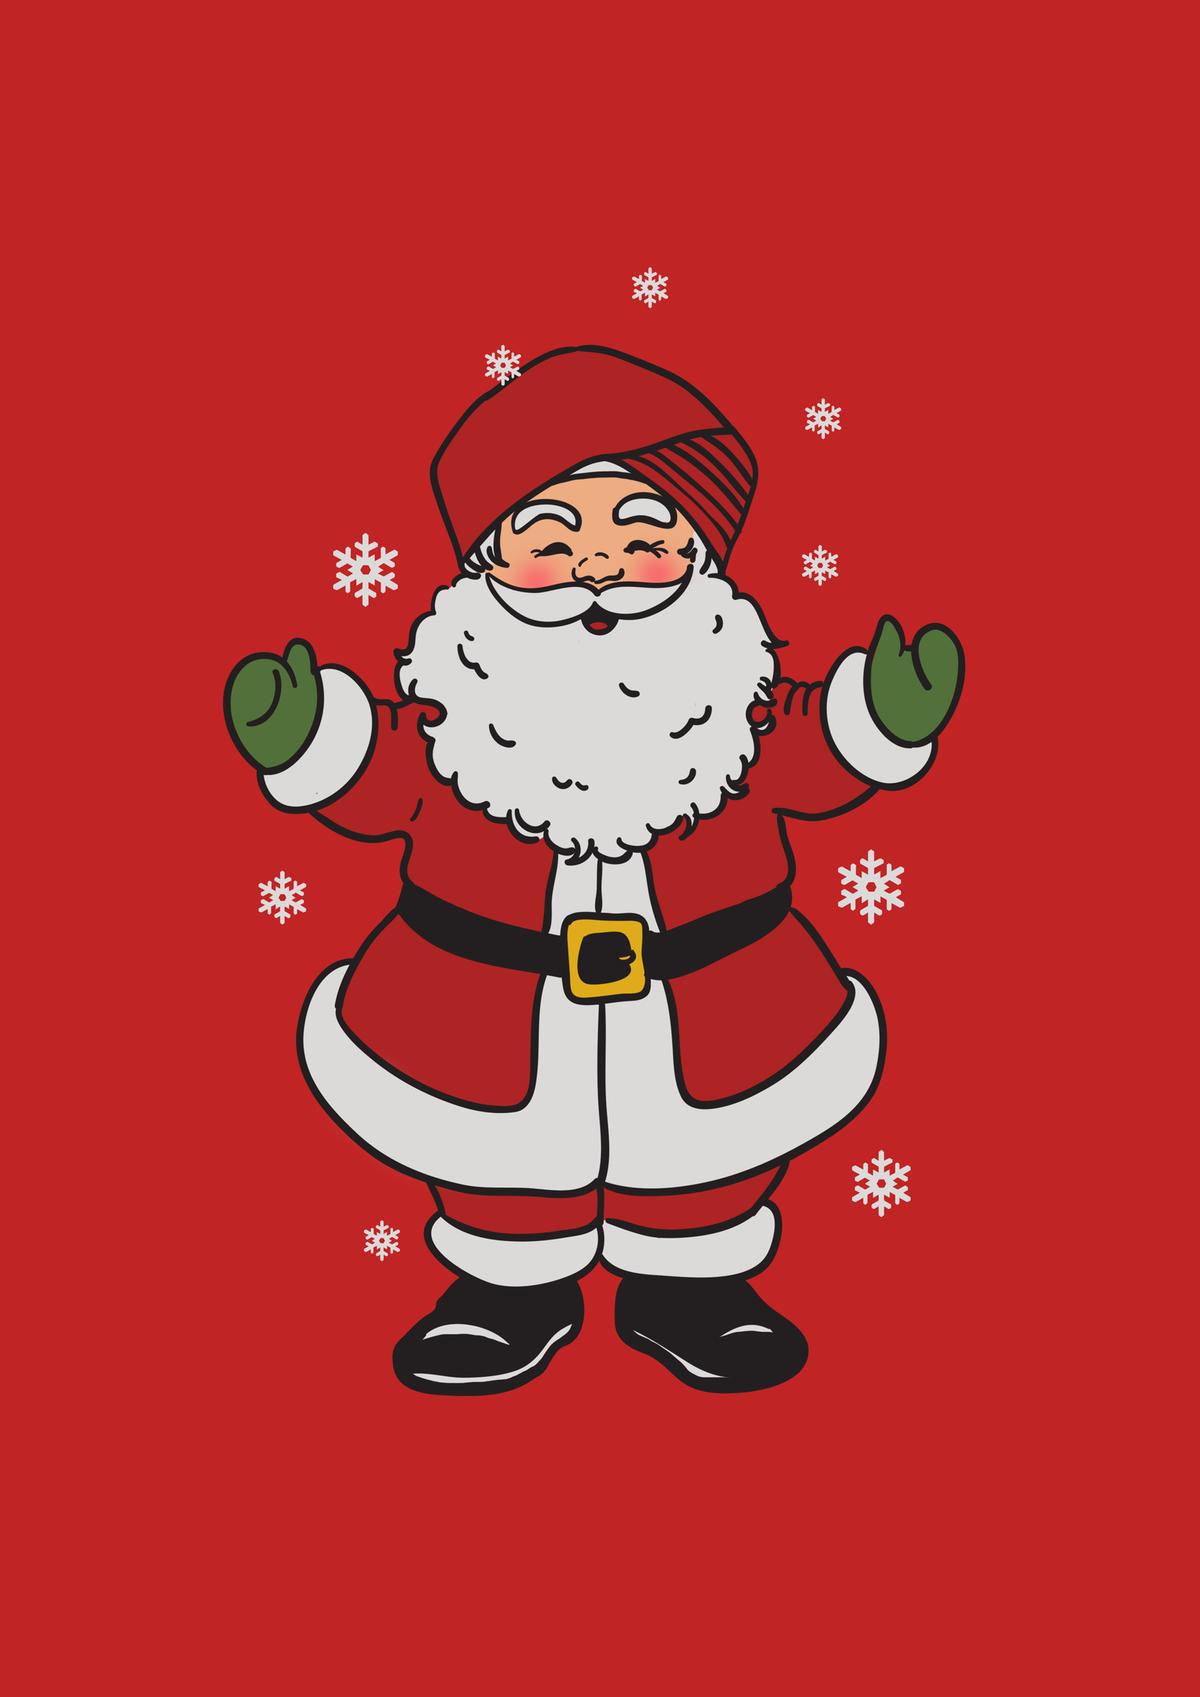 Christmas Santa with a Sikh Turban